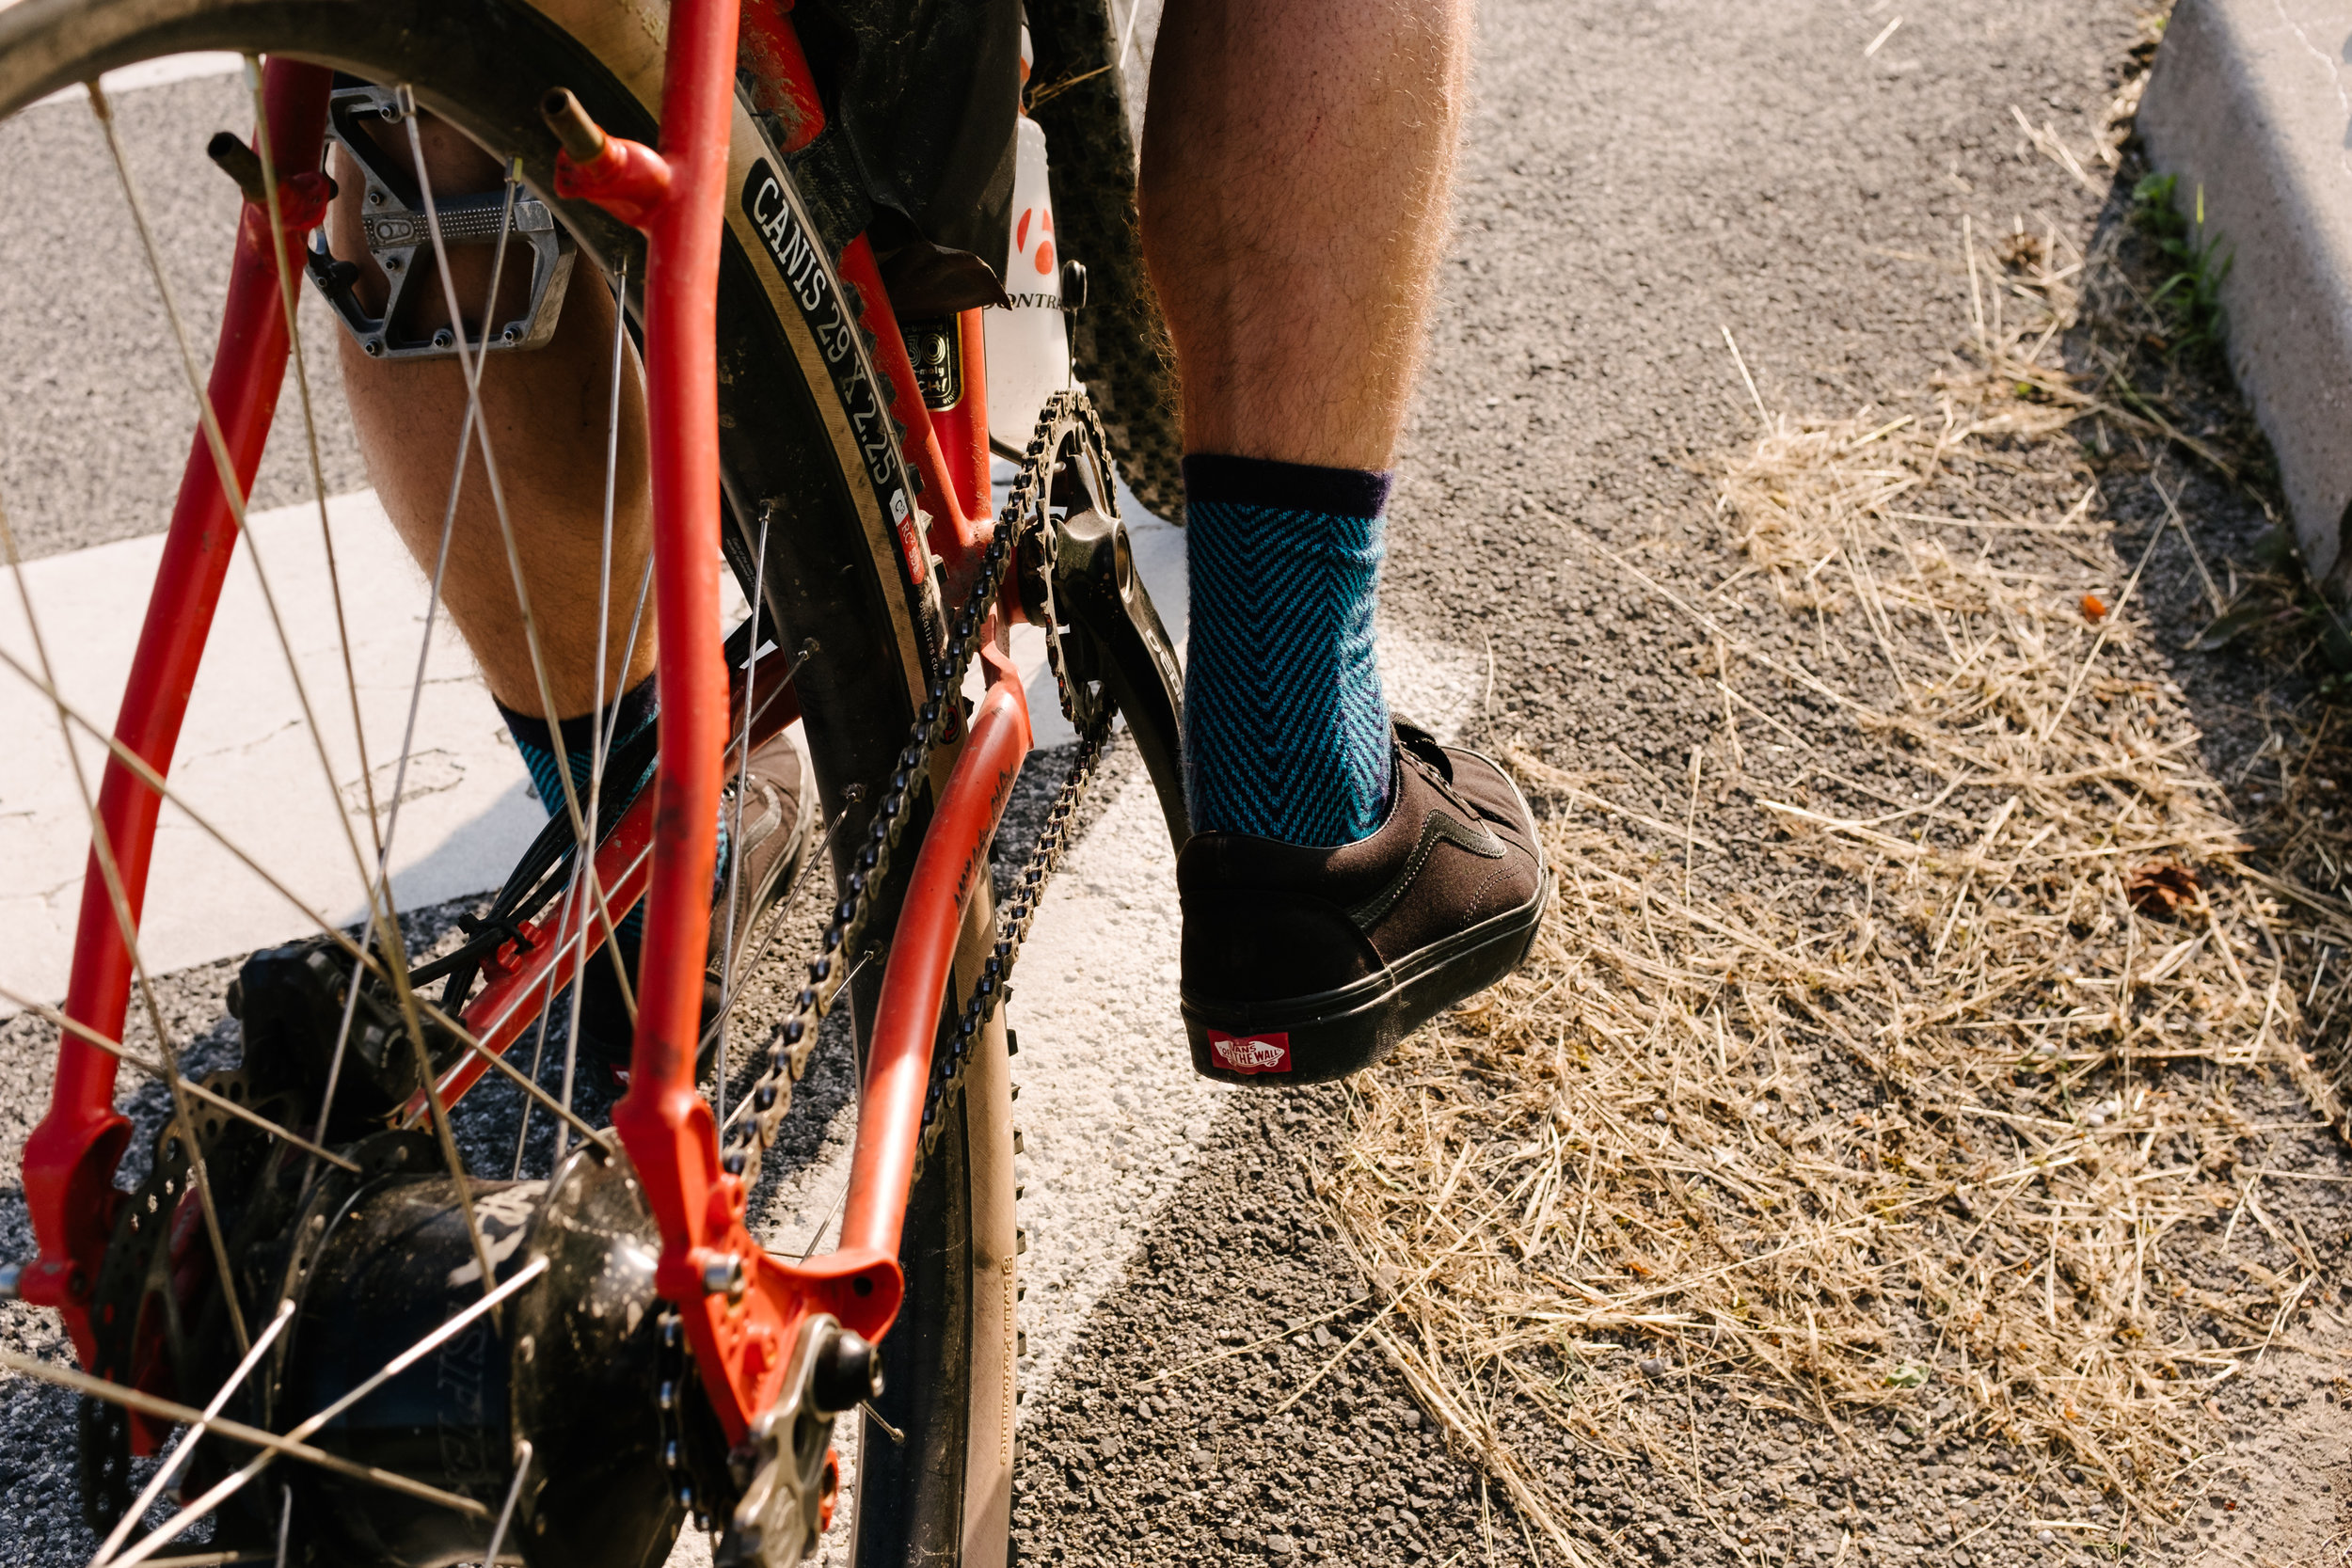 BenReadPhotography_Bikepacking-76.jpg